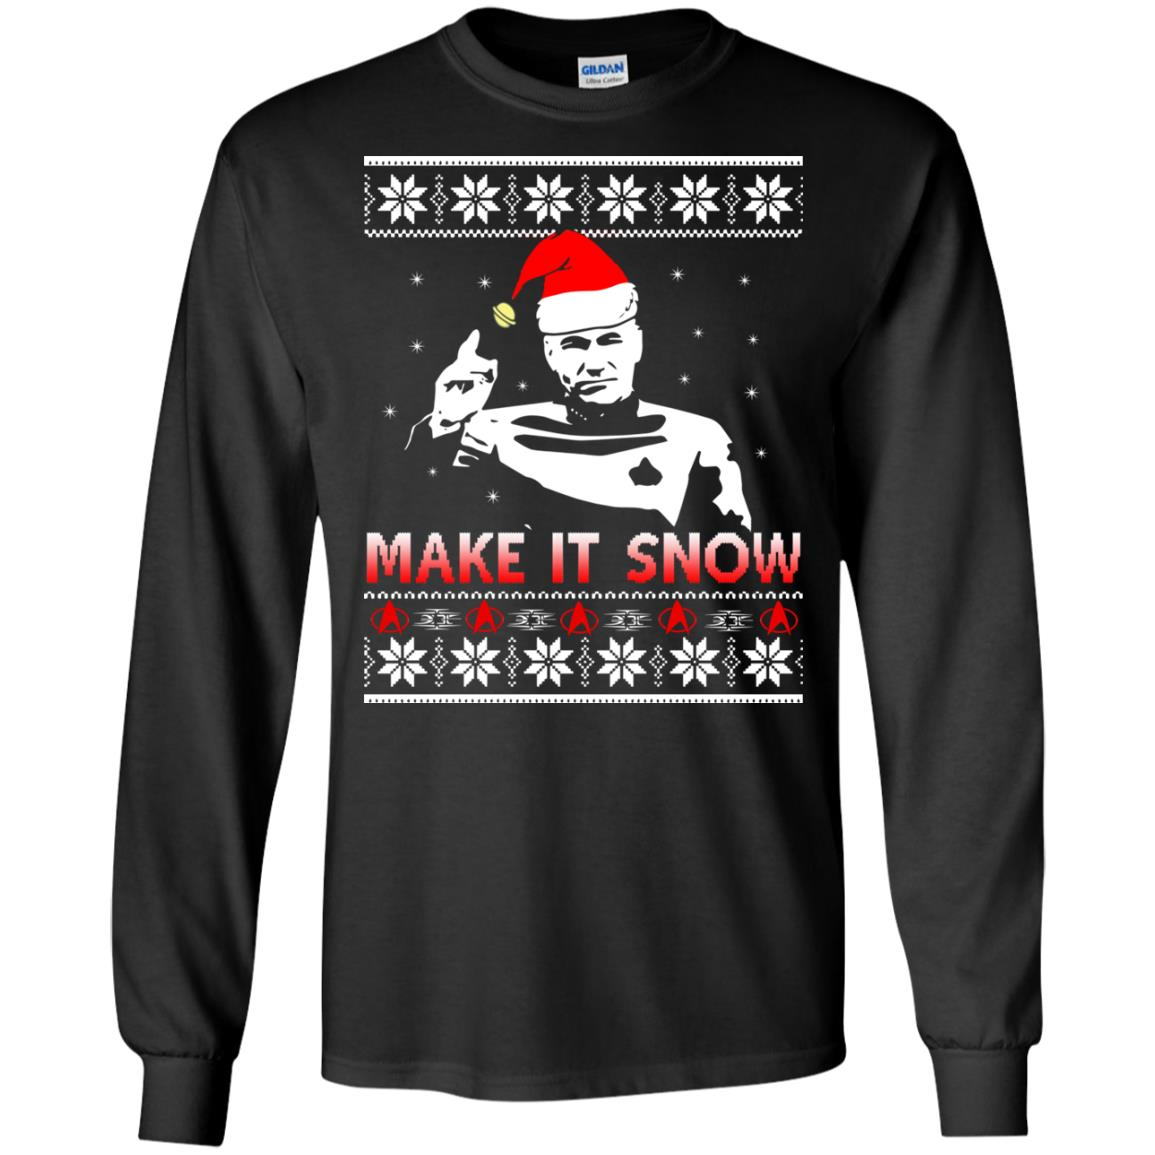 image 2407 - Star Trek make it snow Christmas Sweater, Shirt